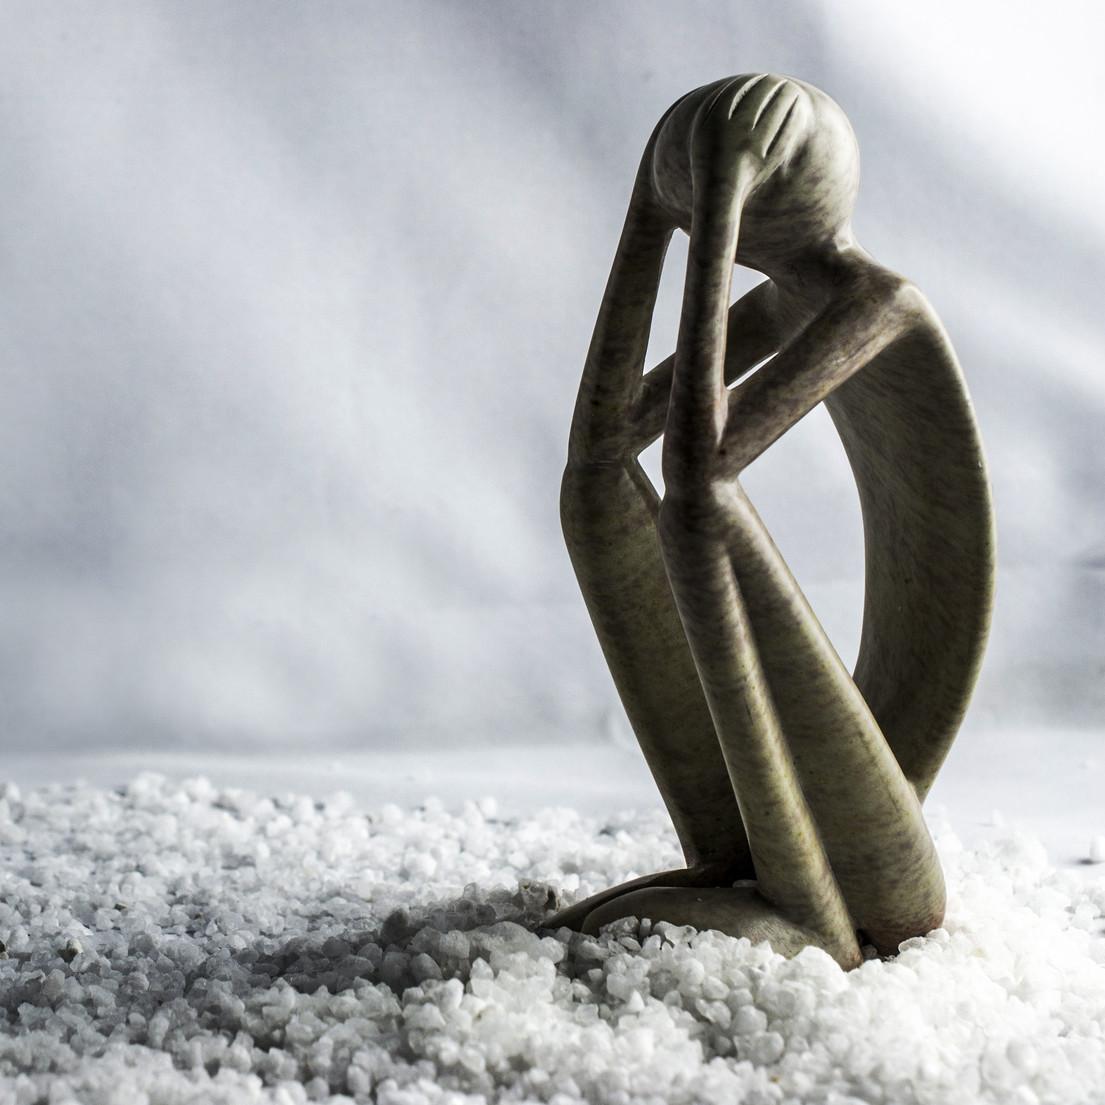 Statue of sadness